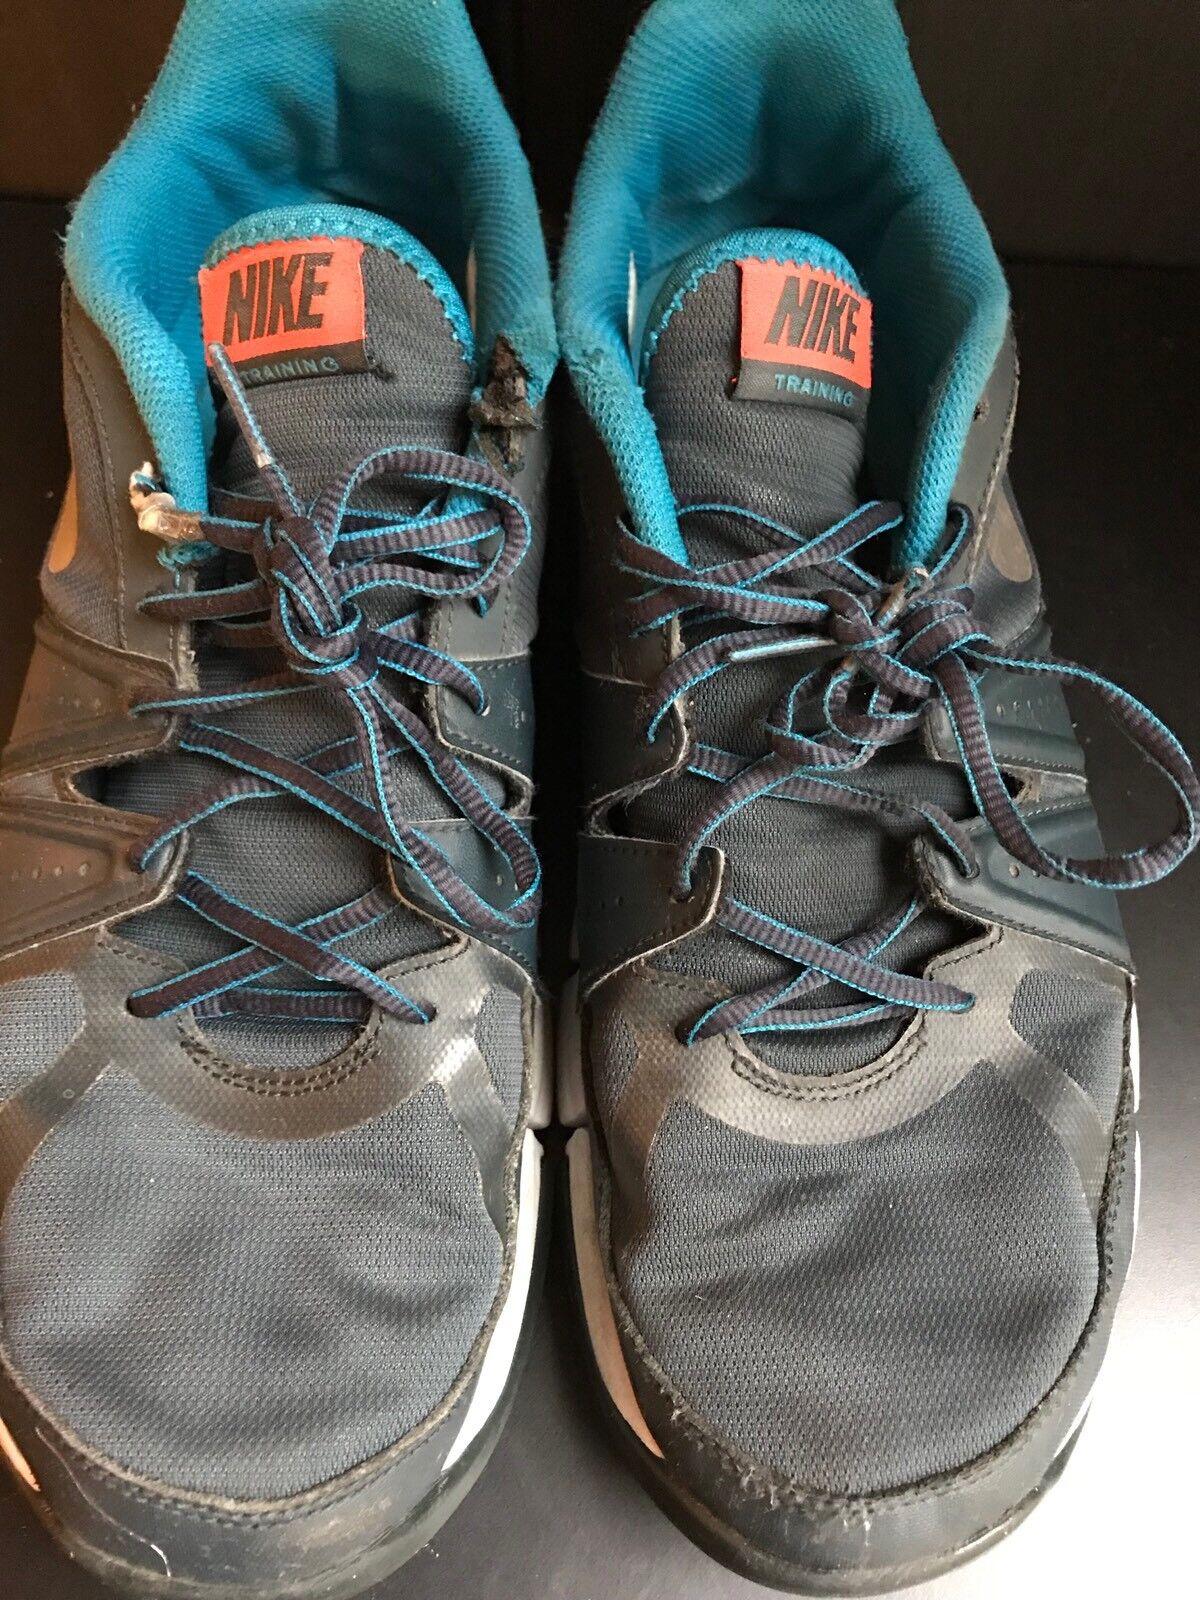 Used Nike Air Trainning men's size 11.5 Running cross training